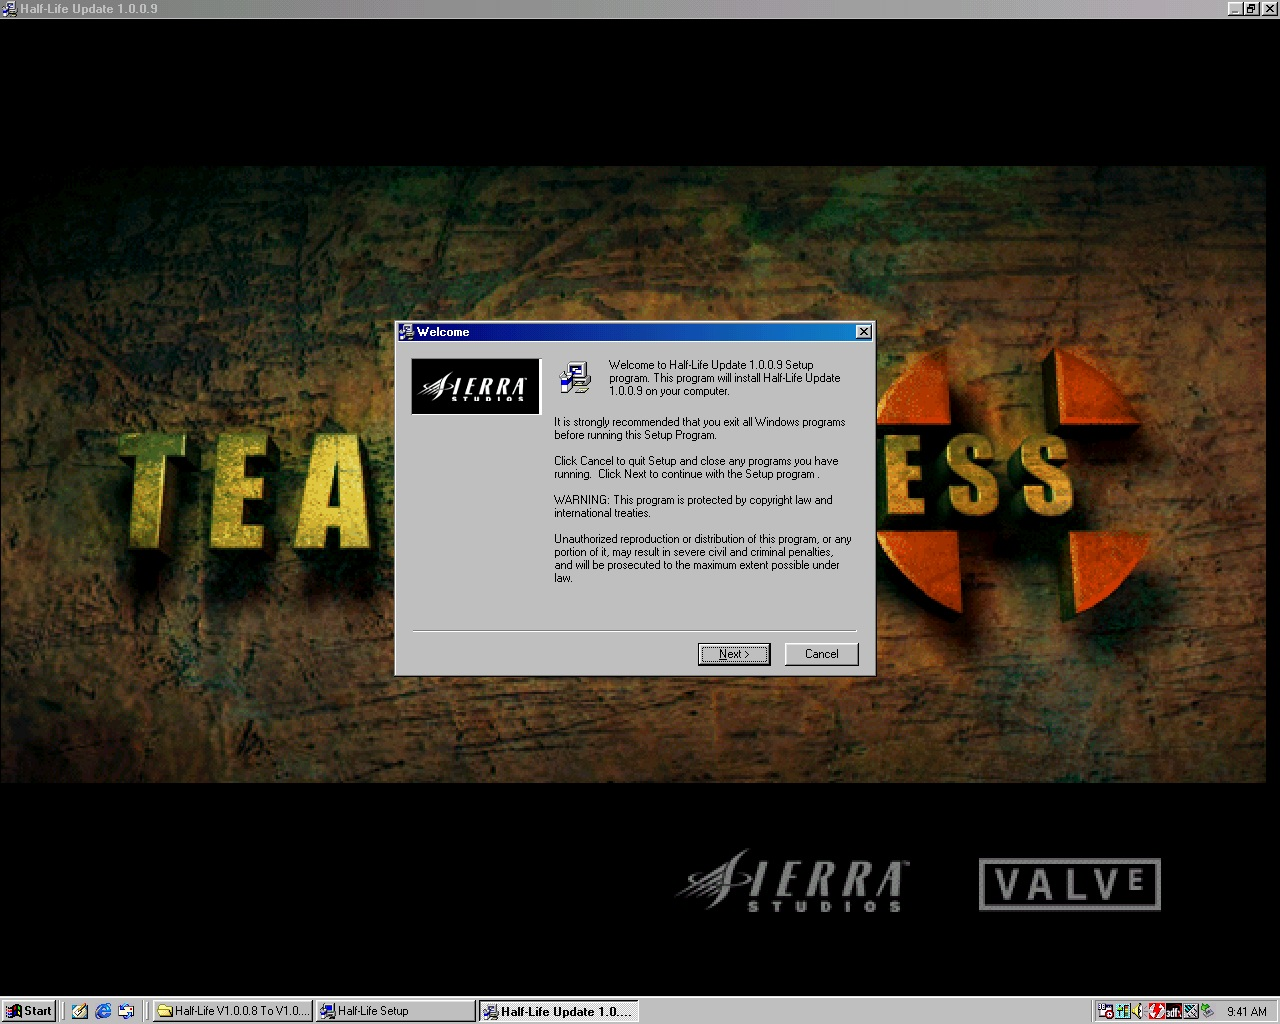 Half-Life Updates Pre & Post 1 1 0 0 file - Counter-Strike